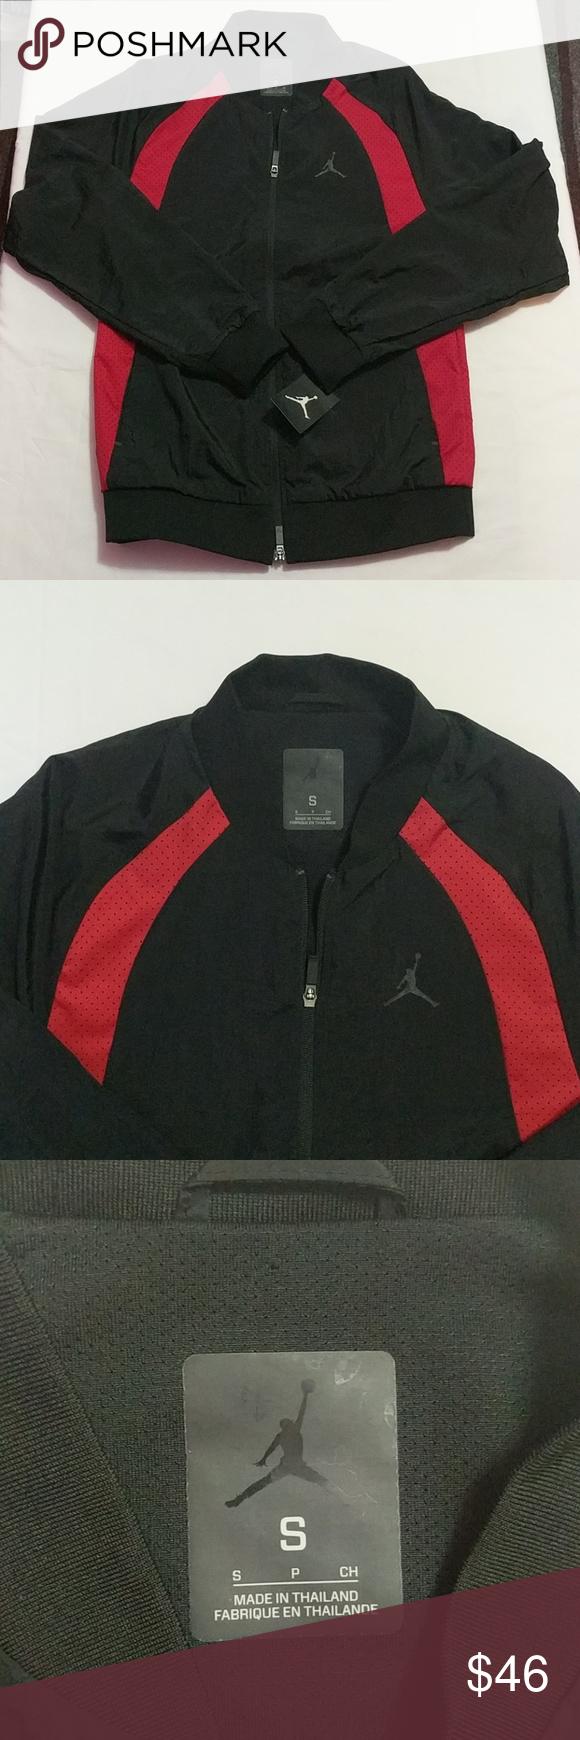 fb02147fa29d Nike Air Jordan Wings Woven Vented Jacket Mens New New with tags. Sizes  Medium